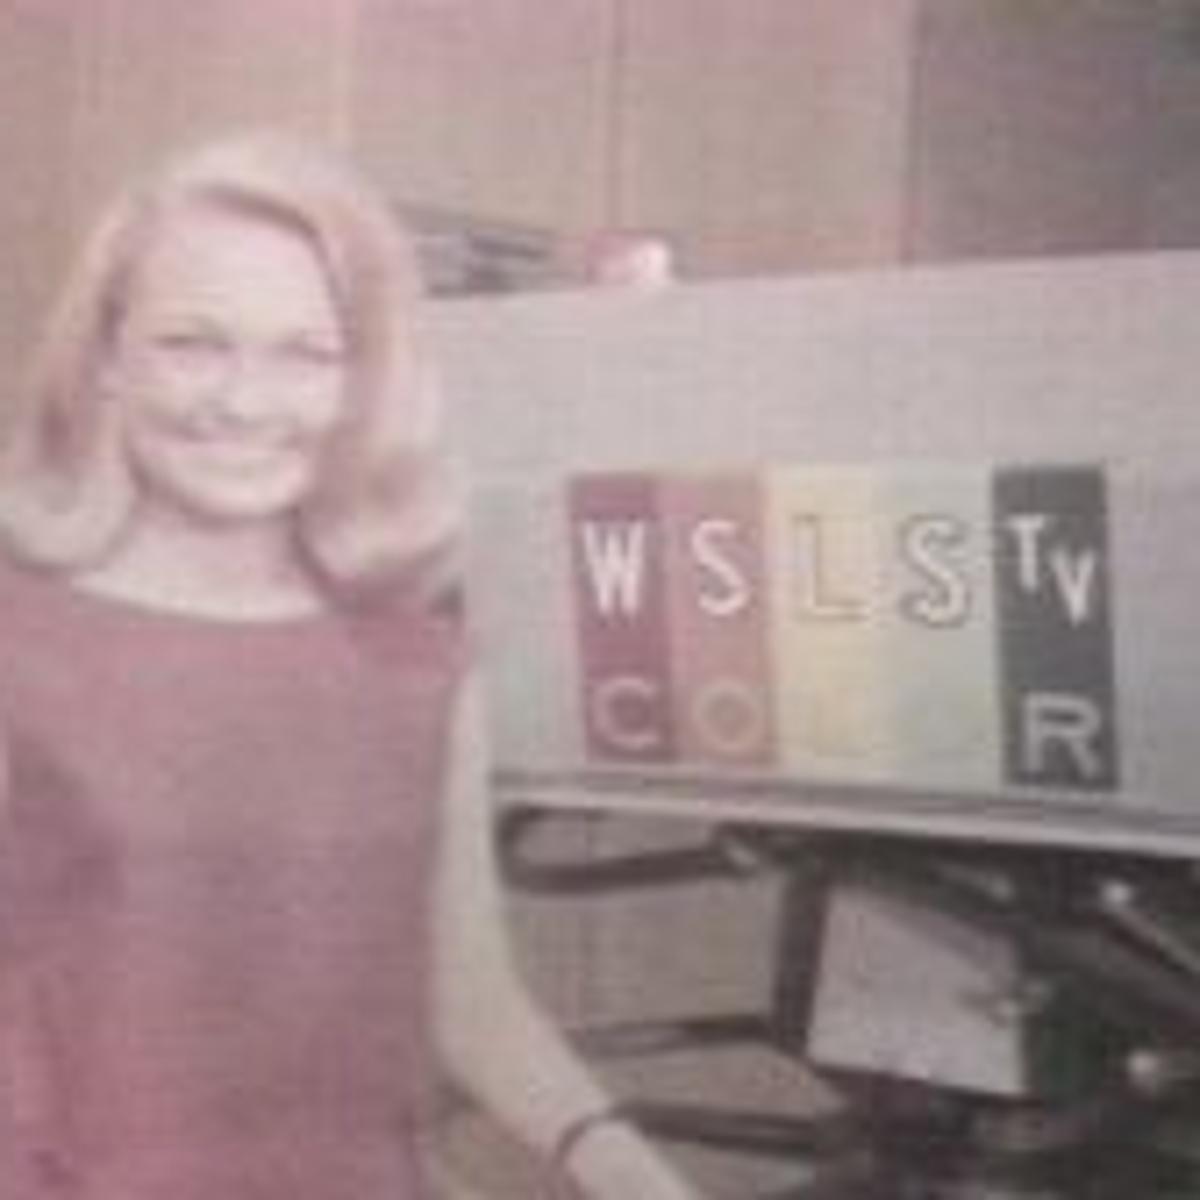 WSLS at 60   Archive   roanoke com